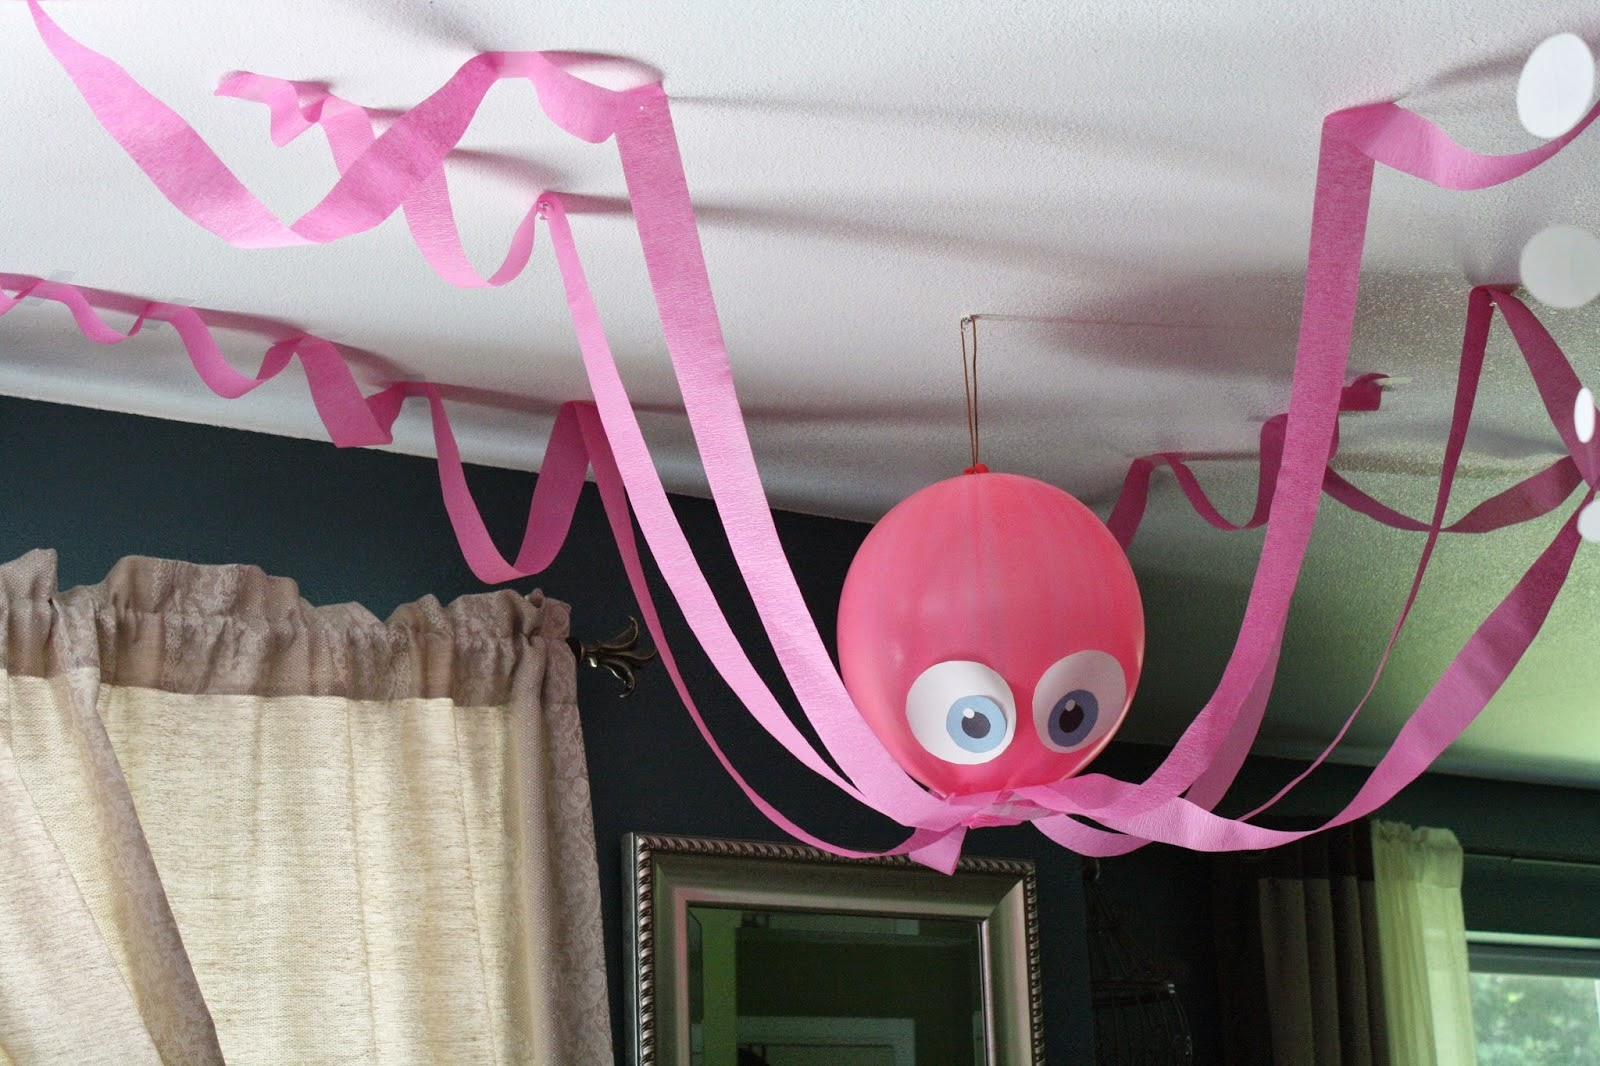 Under the sea wedding decoration ideas  Almis Gcia almagmarentes on Pinterest